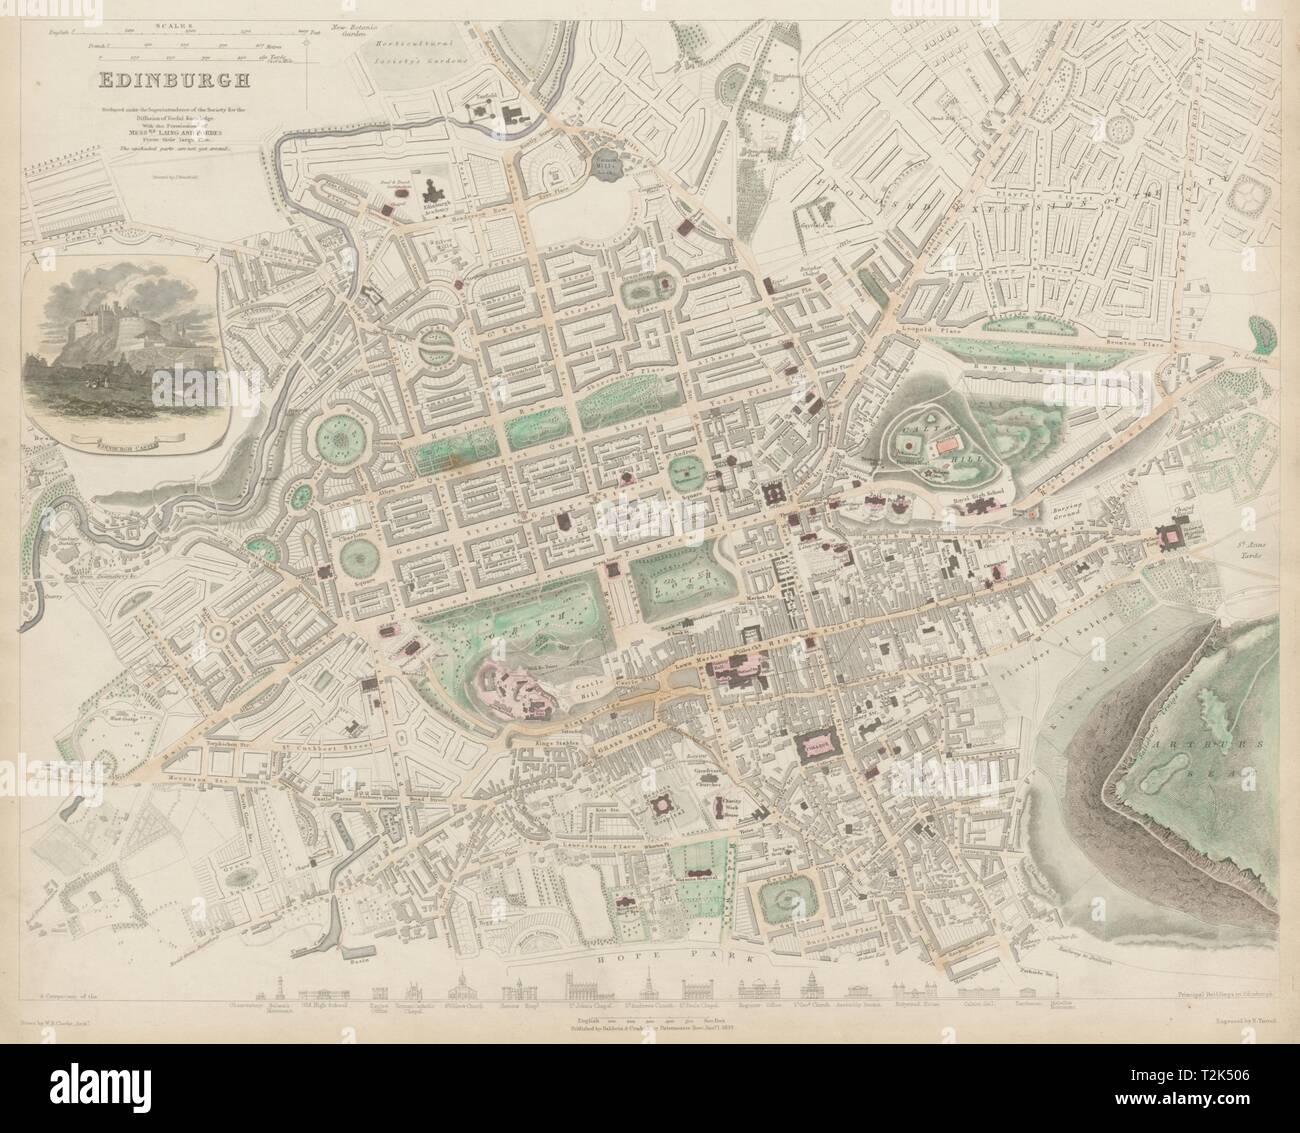 EDINBURGH antique town city map plan. Key buildings profiles. SDUK 1844 Stock Photo